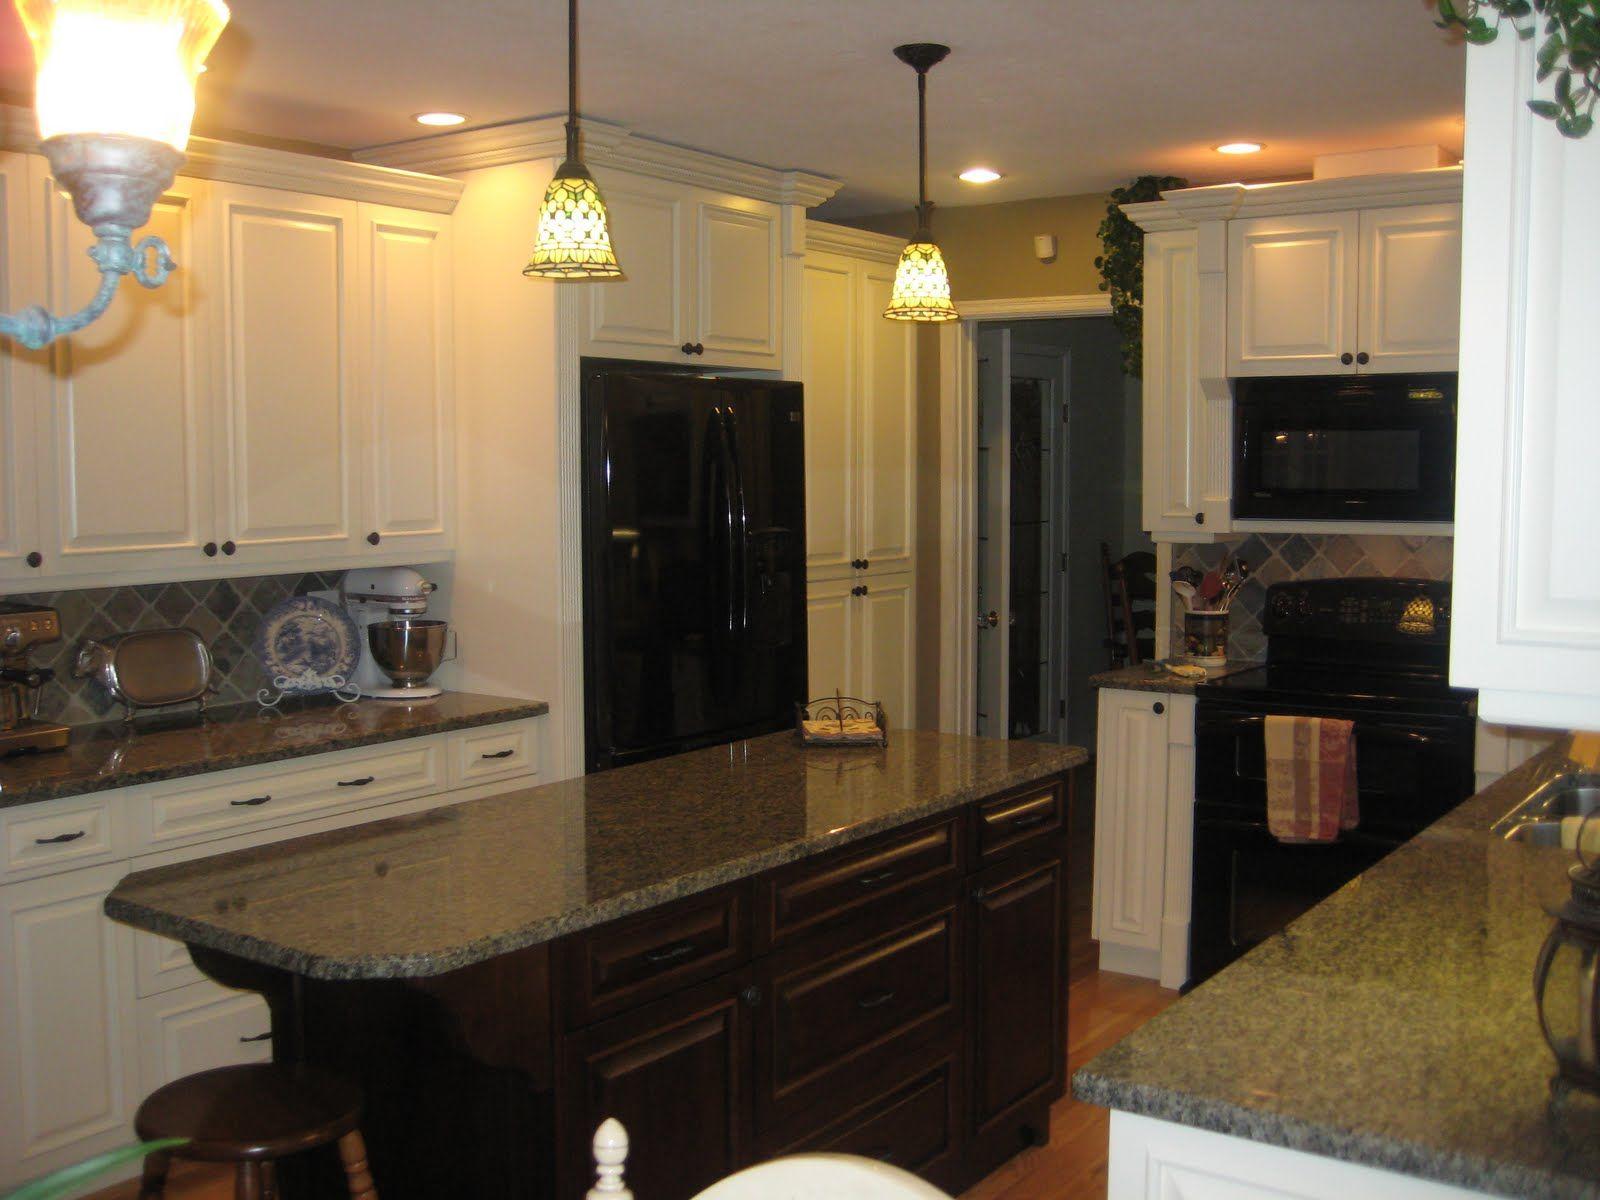 Remodelaholic White Kitchen Tour Guest Kitchen Cabinets With Black Appliances Black Countertops Kitchen Countertops Granite Colors